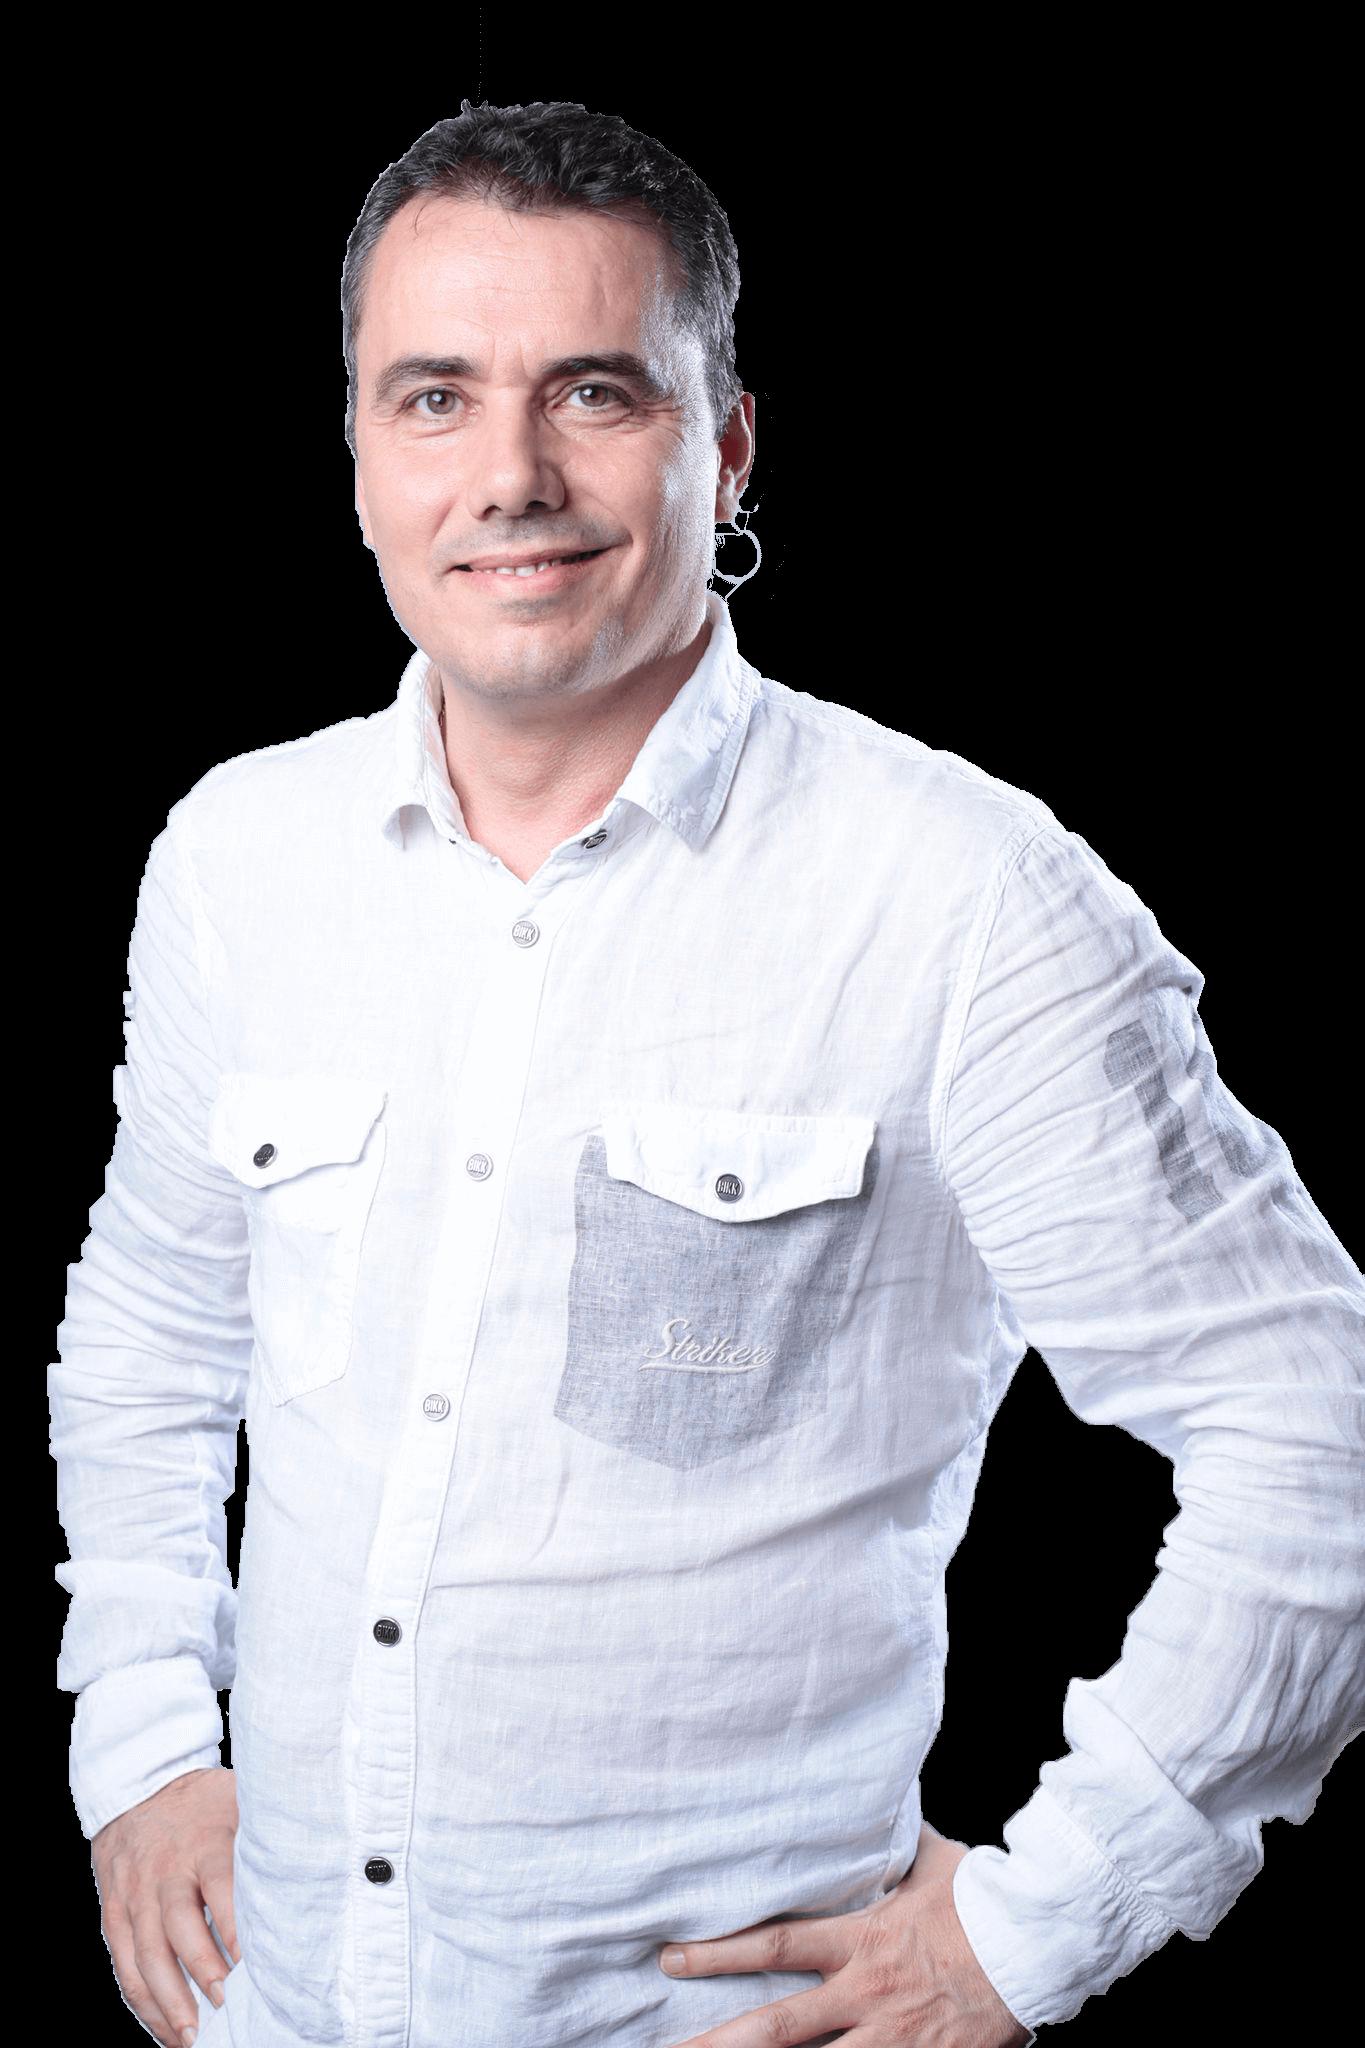 Jose miguel - Curso podcast